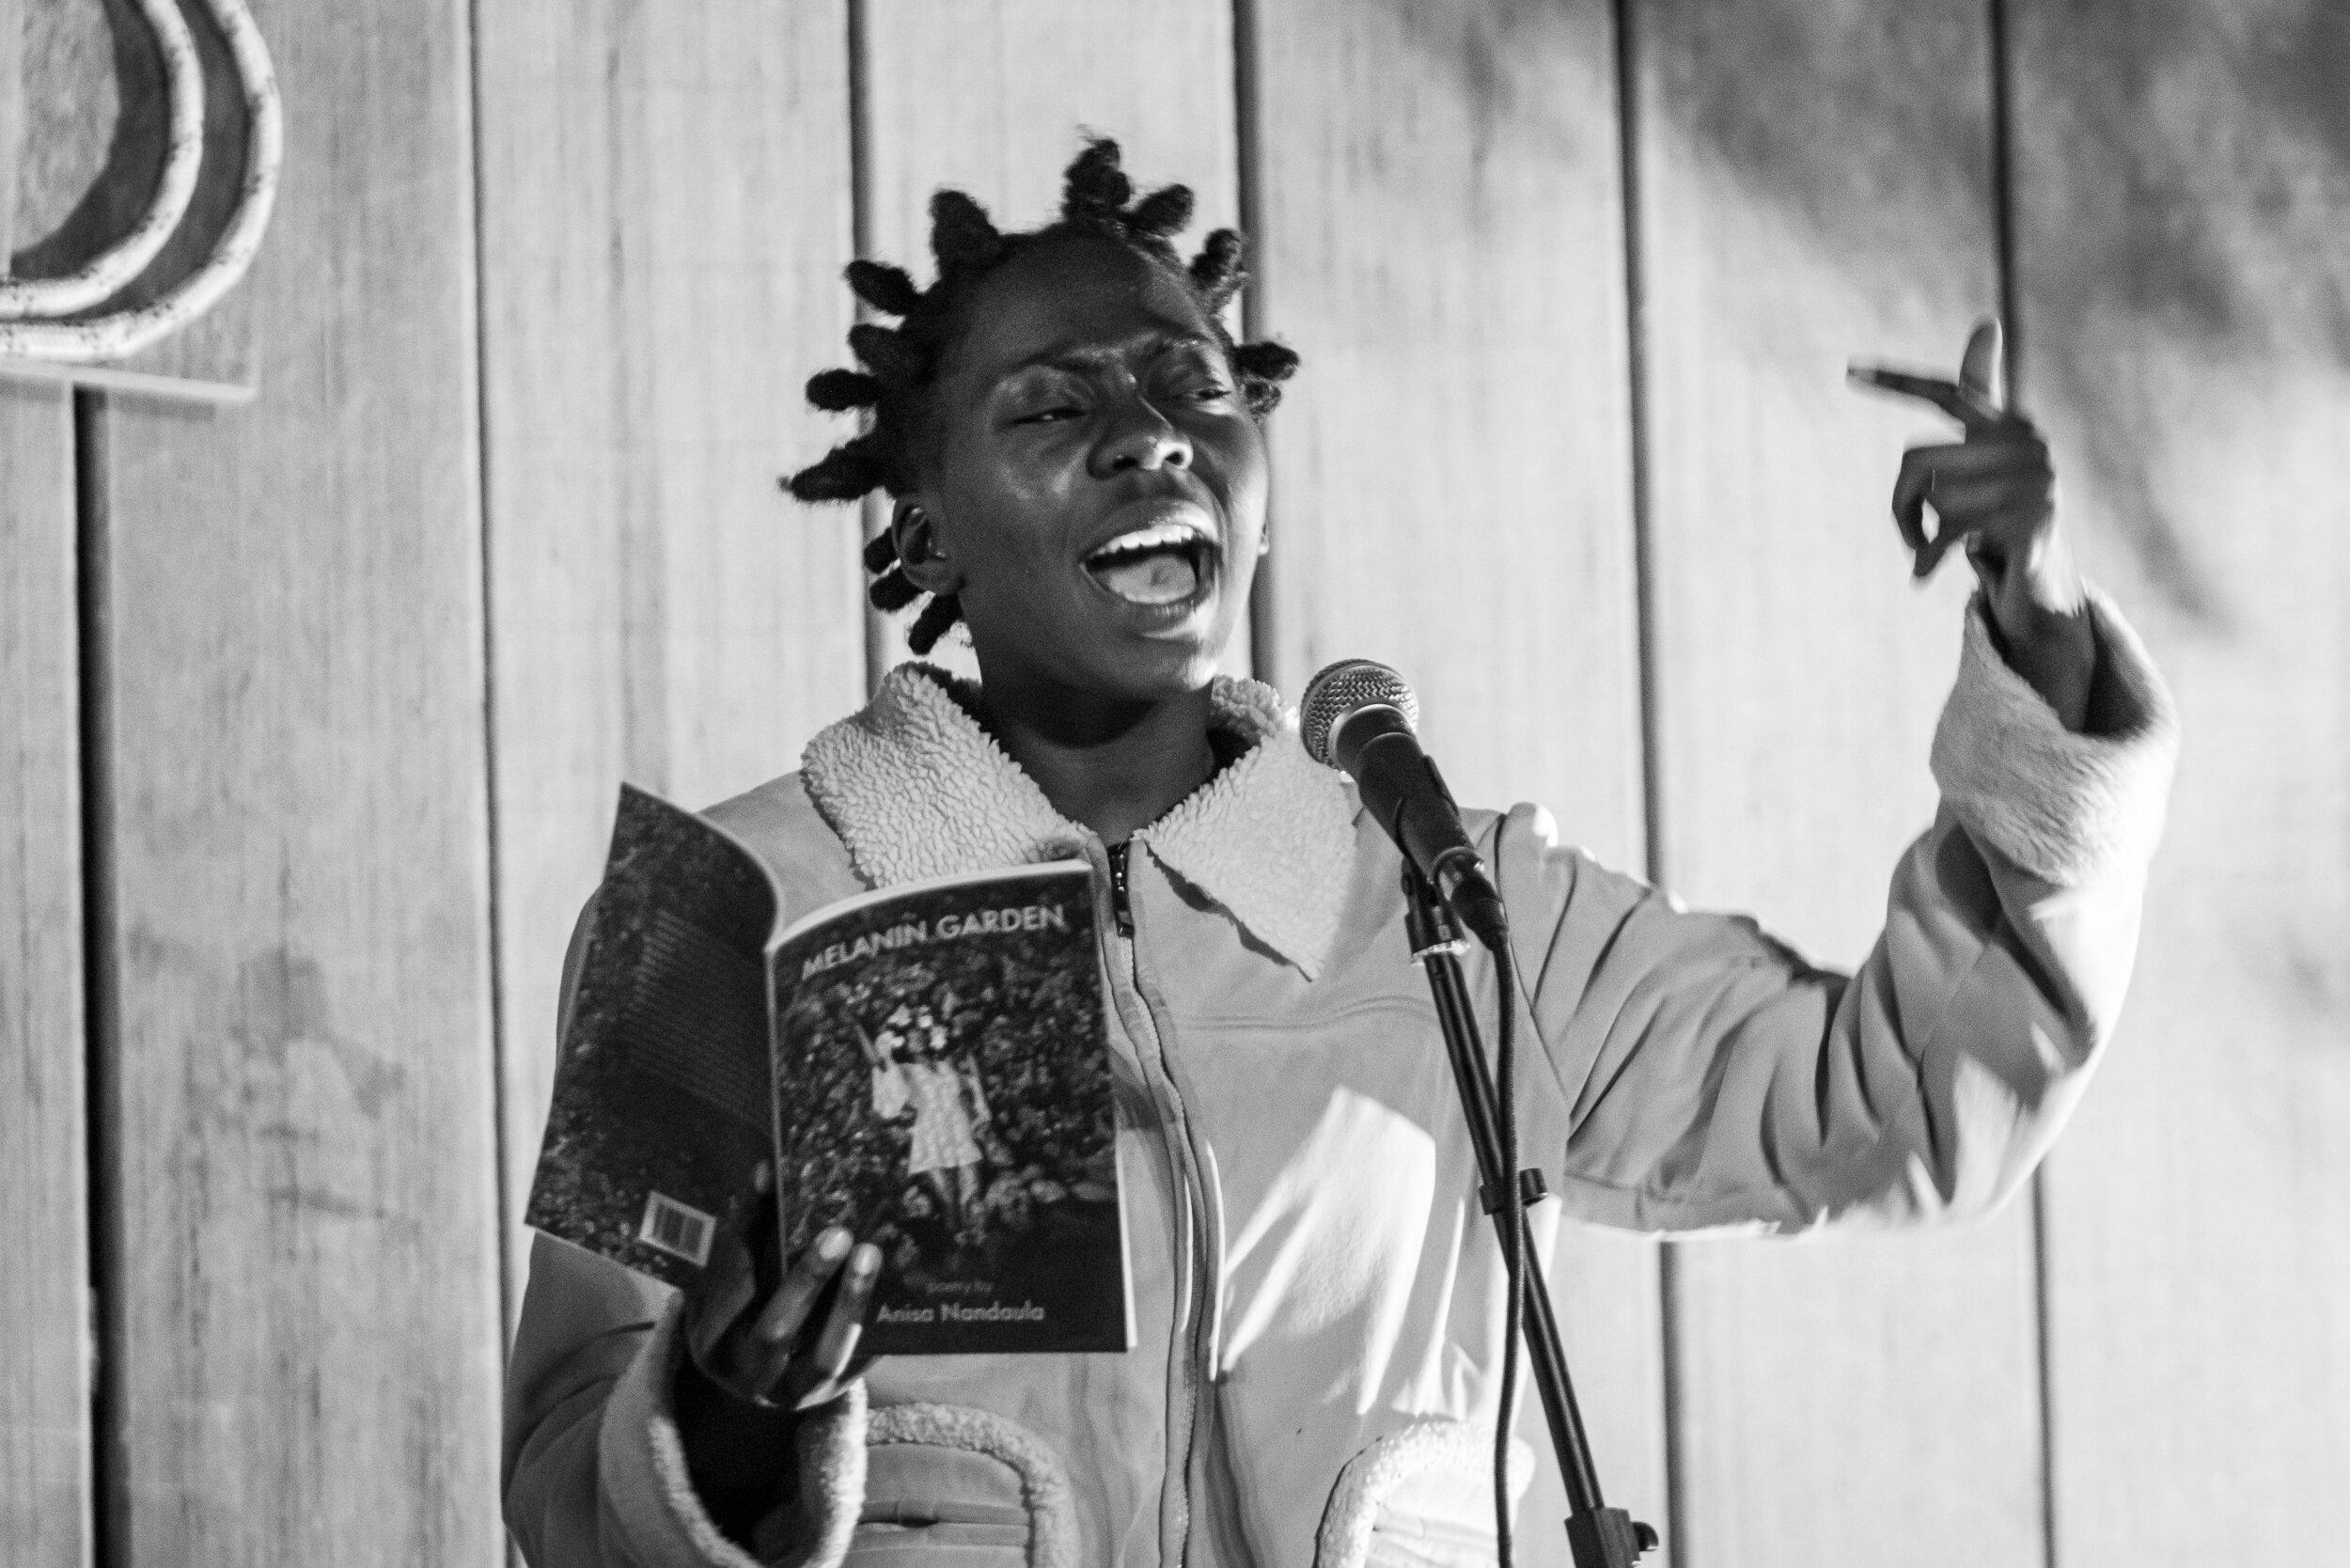 Powerful and revolutionary spoken word artist, Anisa Nandaula.  https://www.anisanandaula.com/